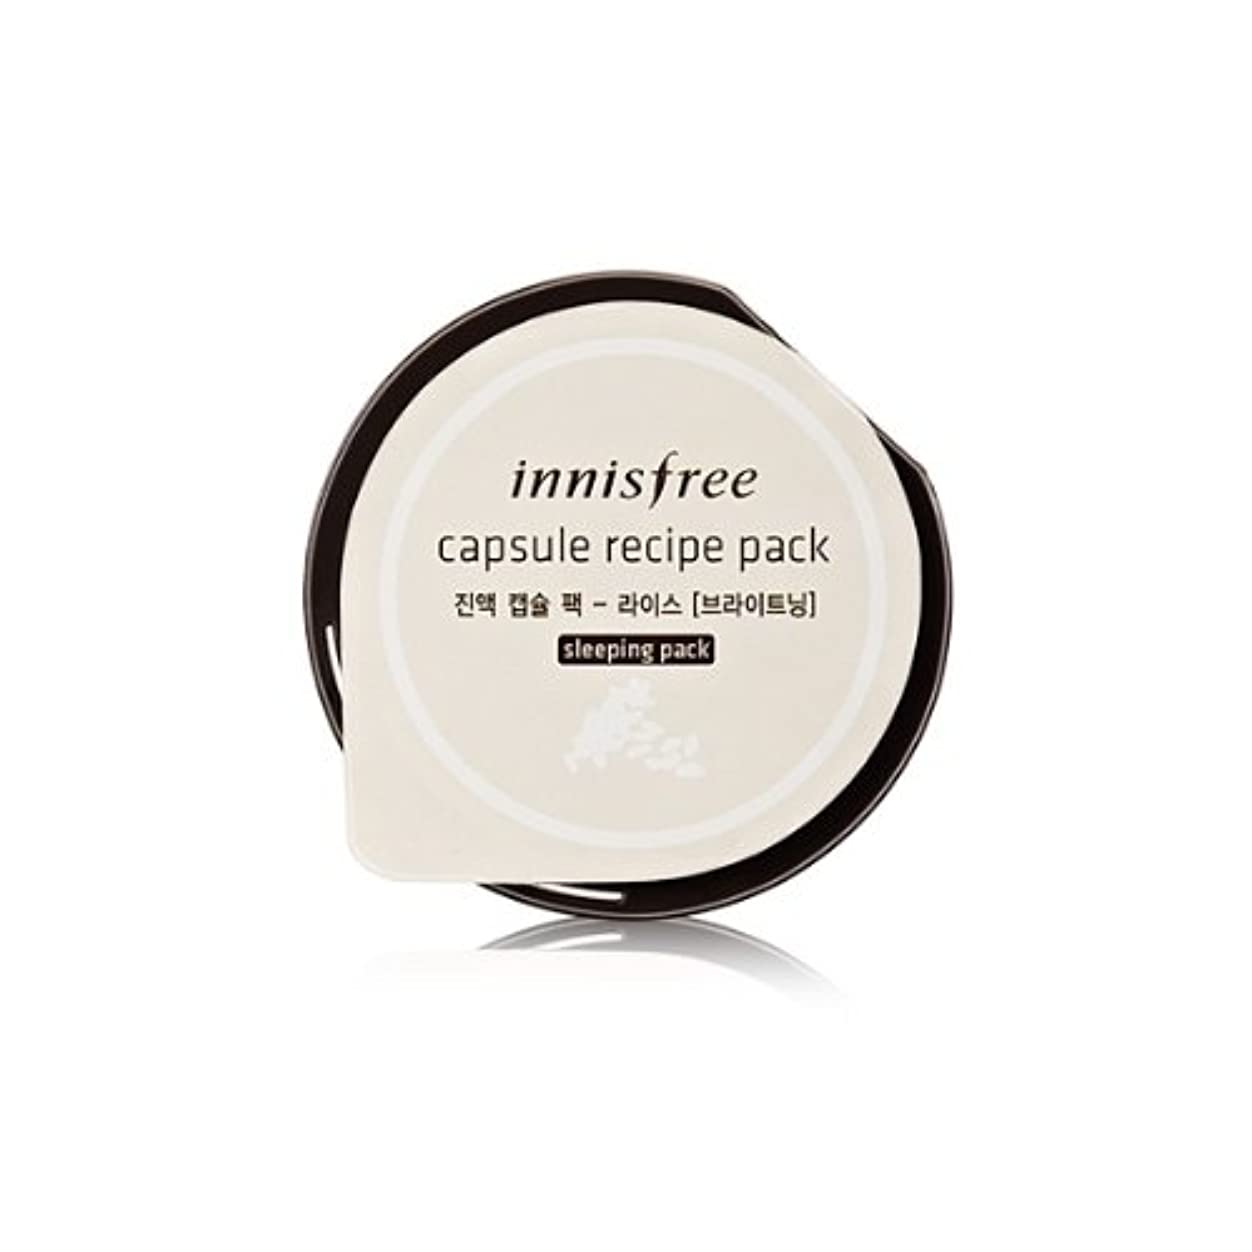 innisfree(イニスフリー) CAPSULE RECIPE PACK RICE 液 カプセル スリーピング パック ライス ブライトニング 10ml